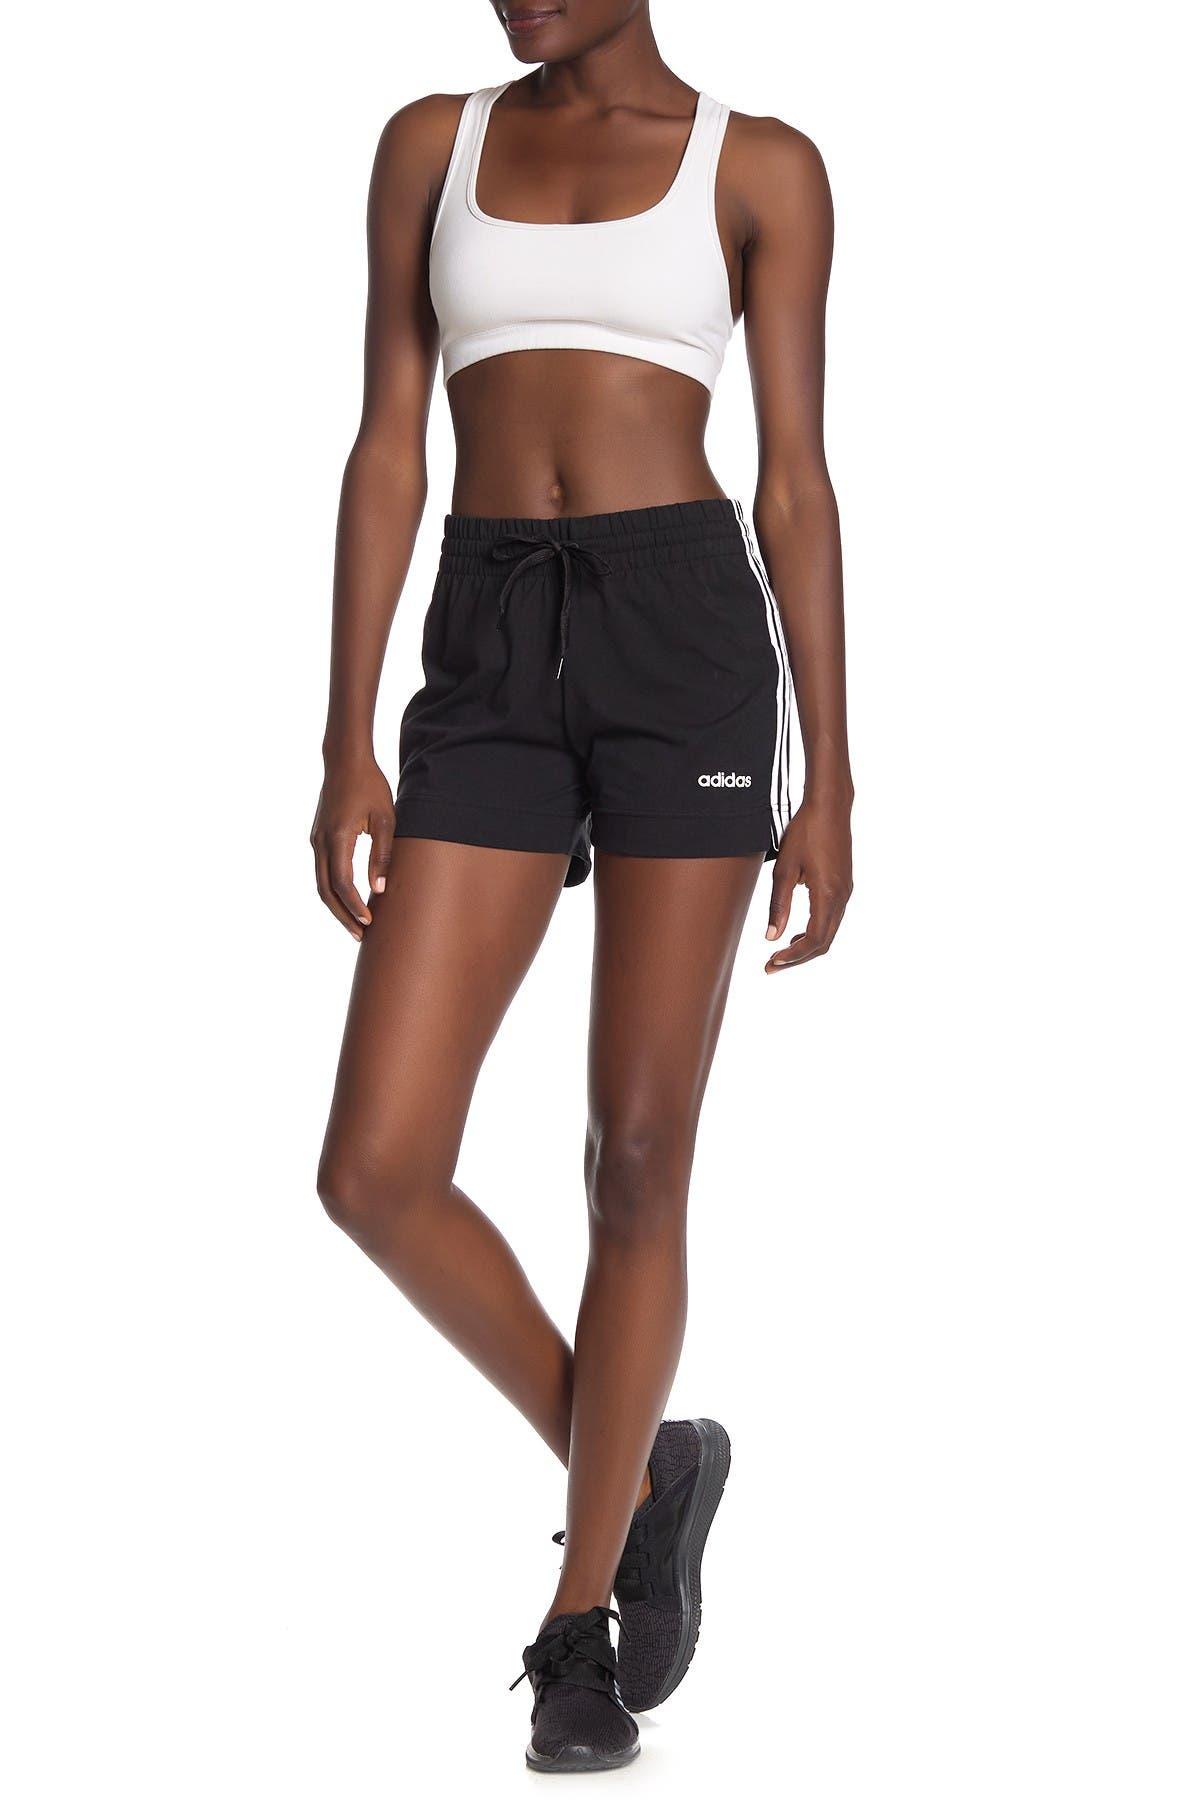 Image of adidas 3-Stripes Jersey Shorts